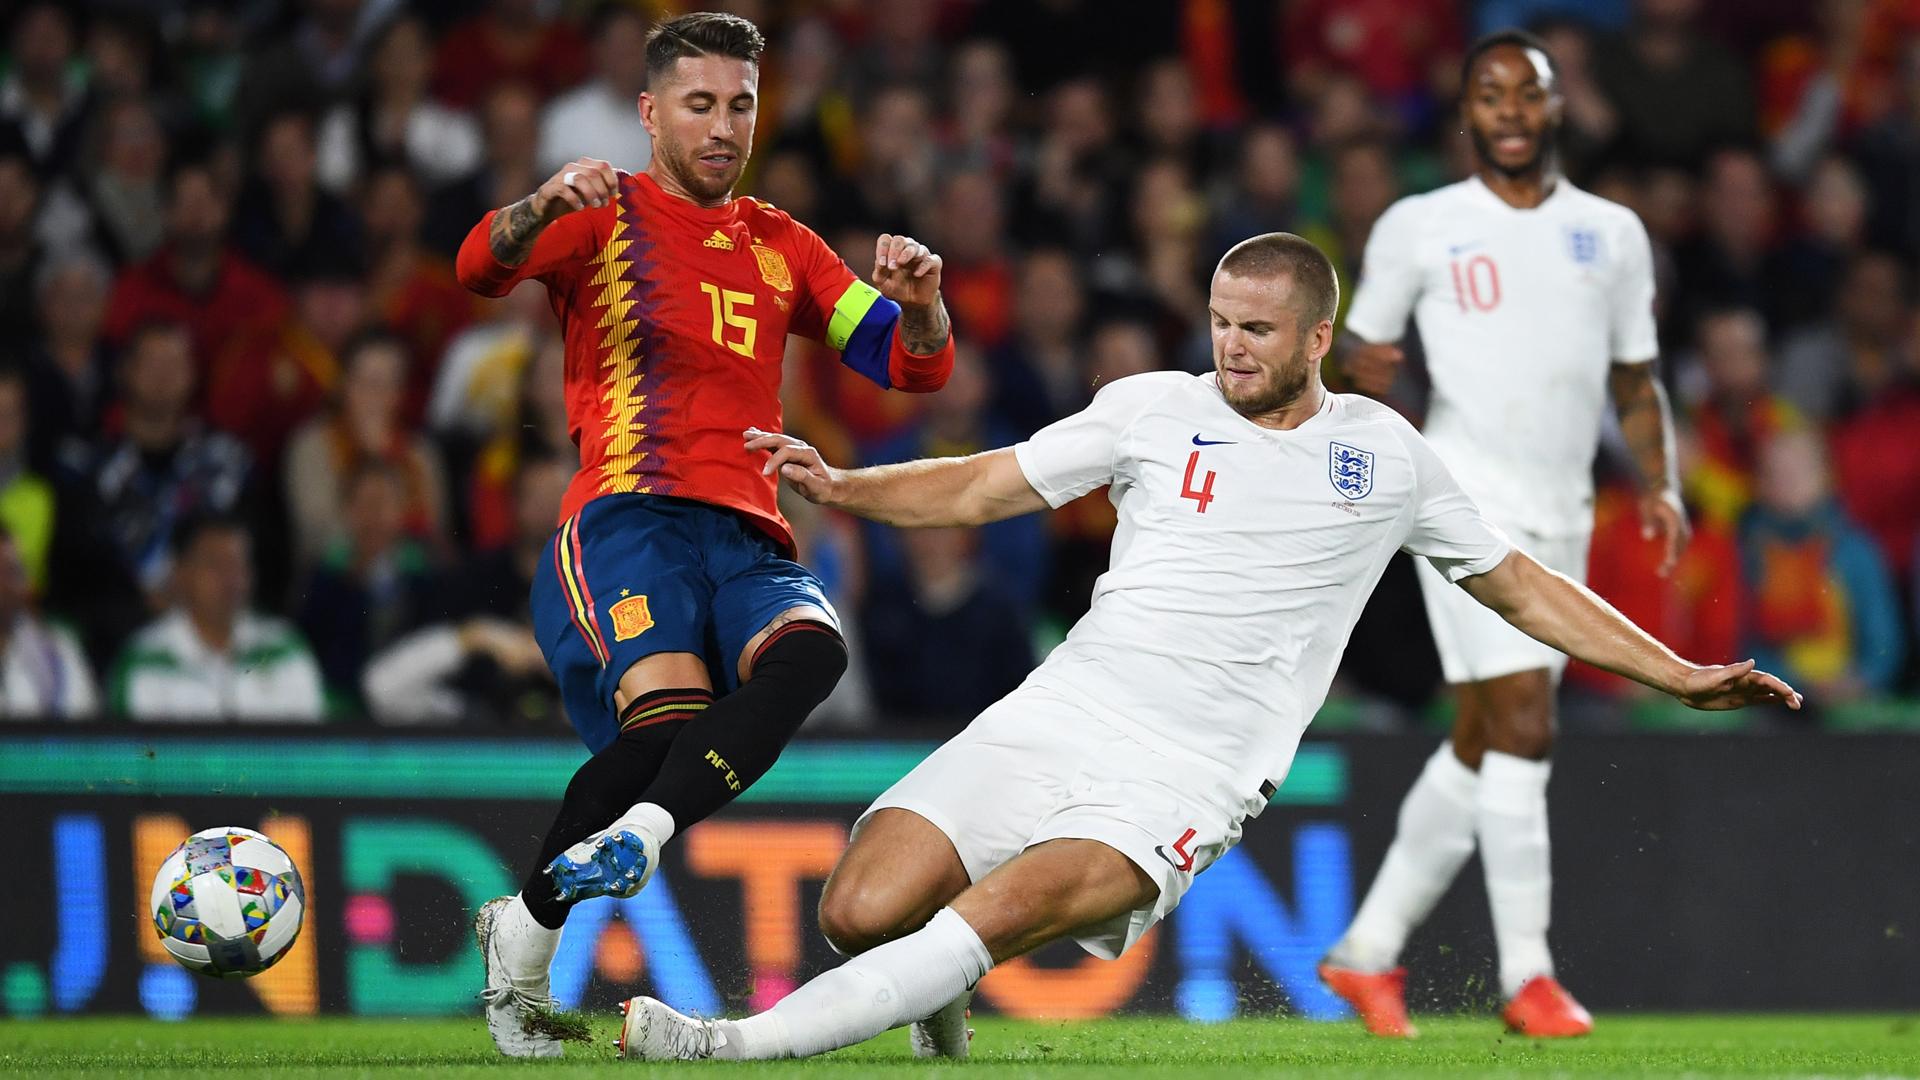 Pochettino: Dier's Ramos tackle highlighted Spurs' attitude